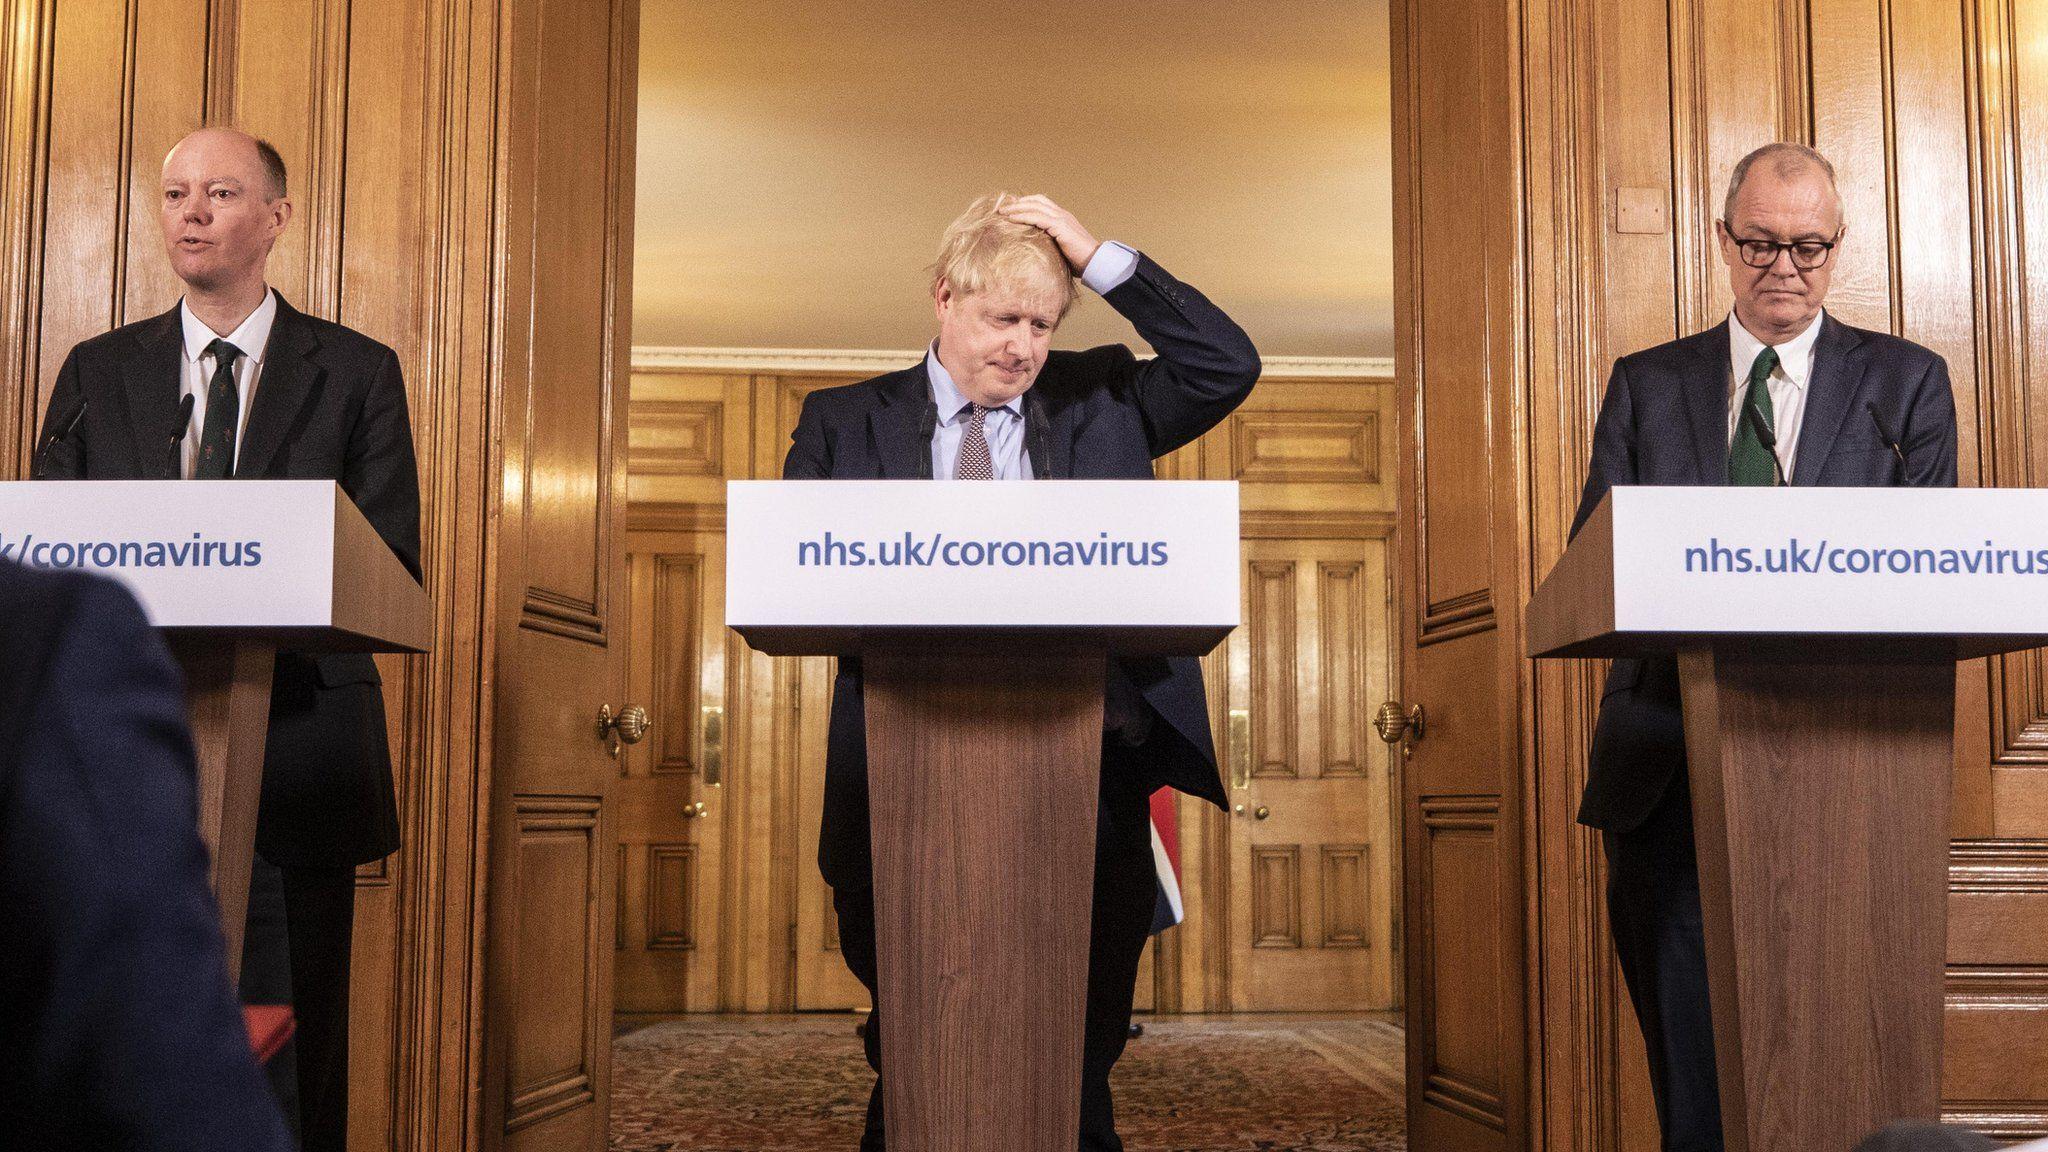 Coronavirus: UK changes course amid death toll fears - BBC News